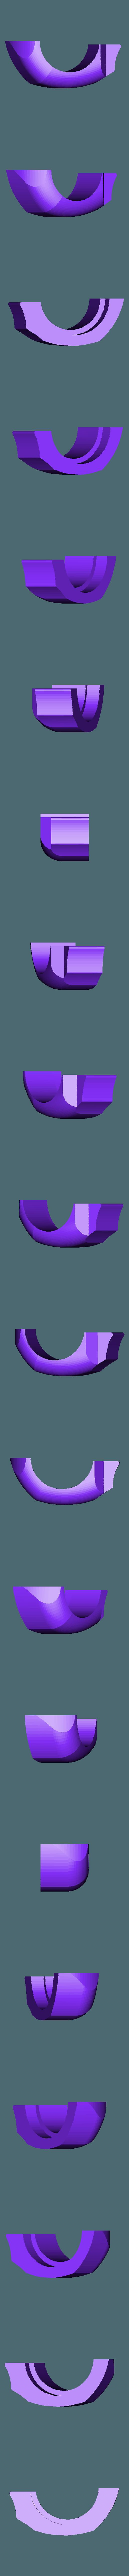 Body_Leg_Base_-_Left.stl Download free STL file Imperial Crusader Mech - New Legs • 3D printable model, GarinC3D